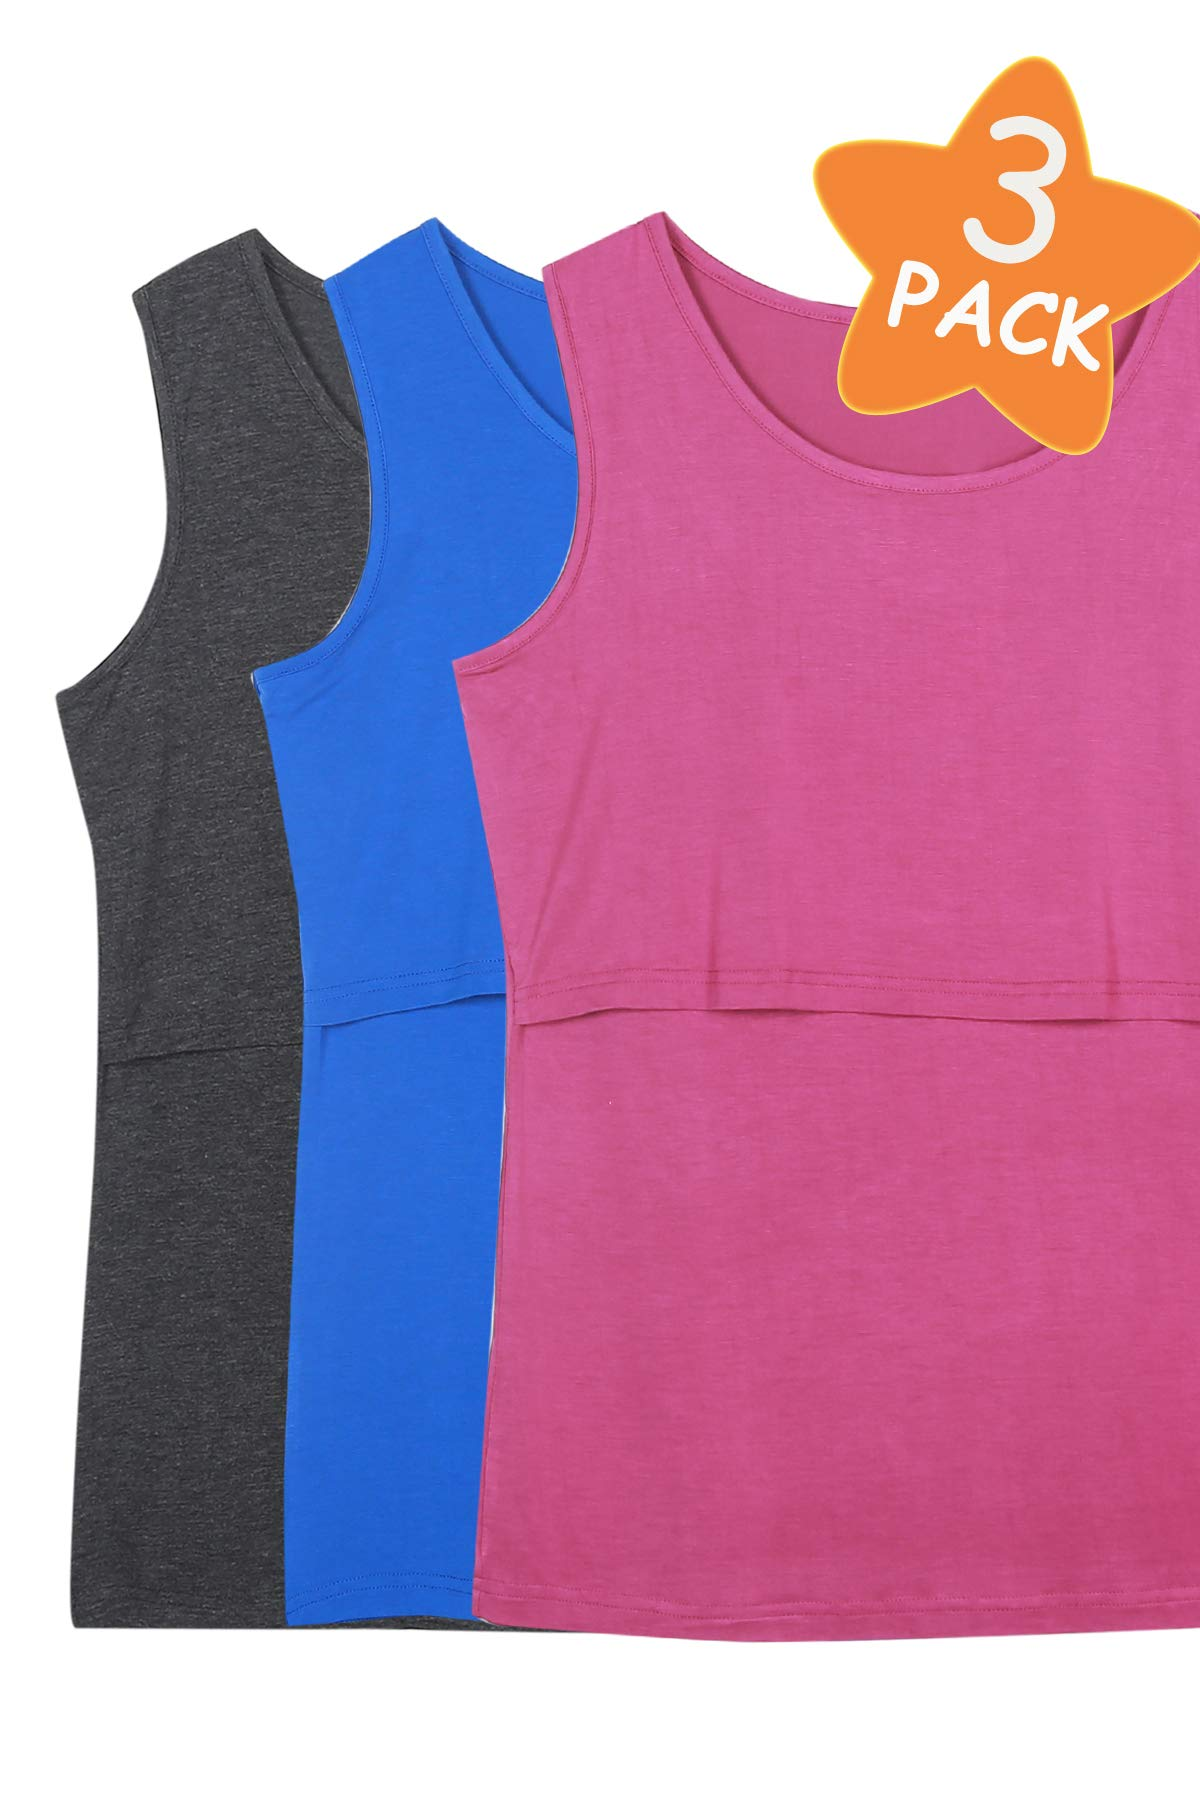 Smallshow Women's 3 Pack Sleeveless Nursing Tank Tops Large,Deep Grey-Fuchsia Rose-Deep Blue